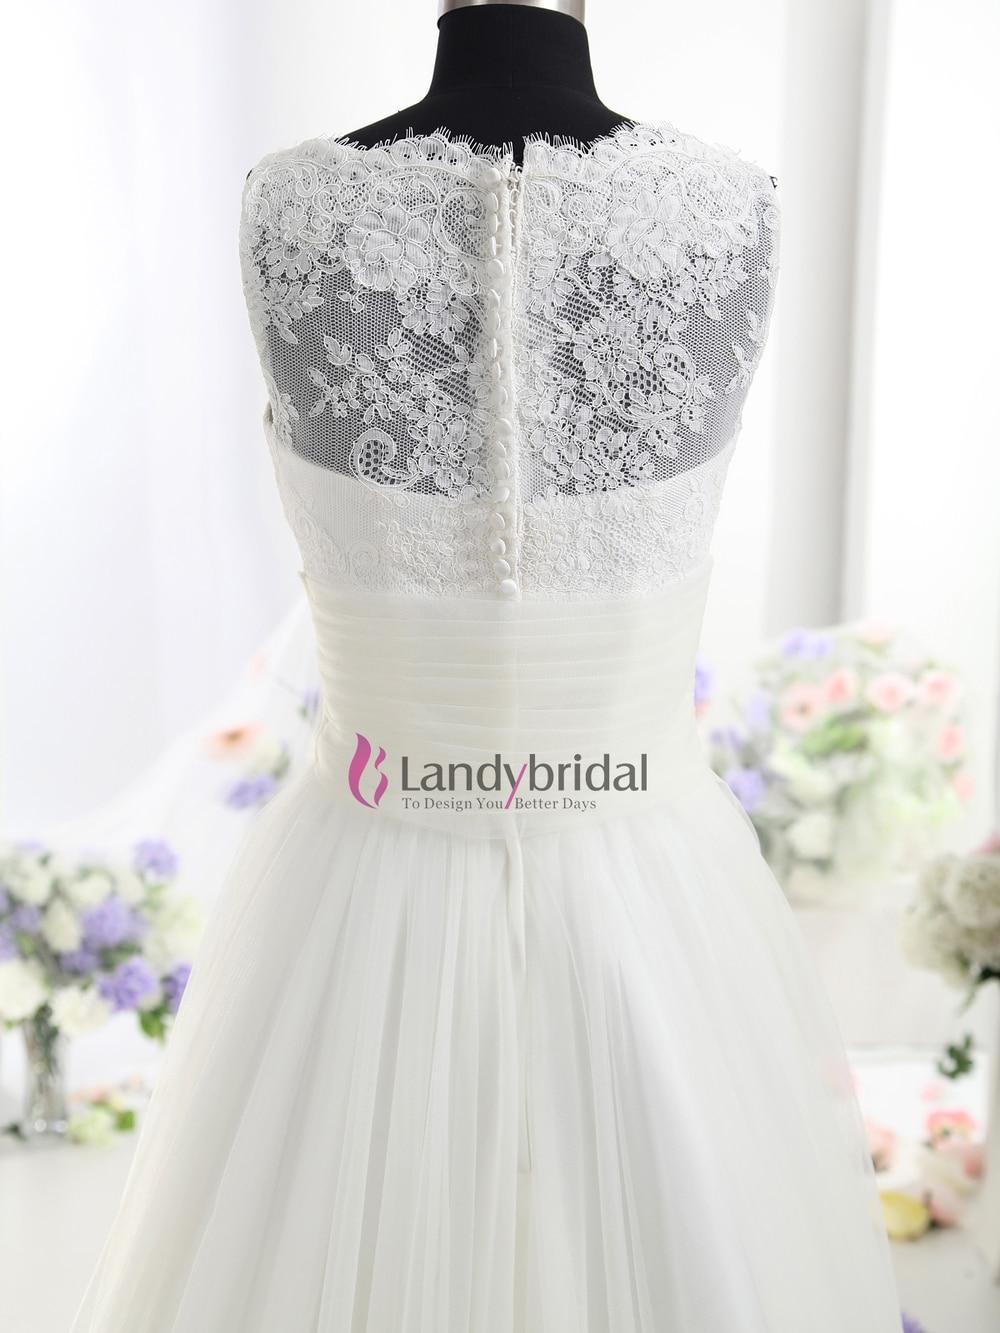 tank top wedding dresses Aliexpress com Buy Lastest Style High Nekline Lace Bodice Tank Top Wedding Dress from Reliable dress wear wedding suppliers on Suzhou Landy Bridal Gown